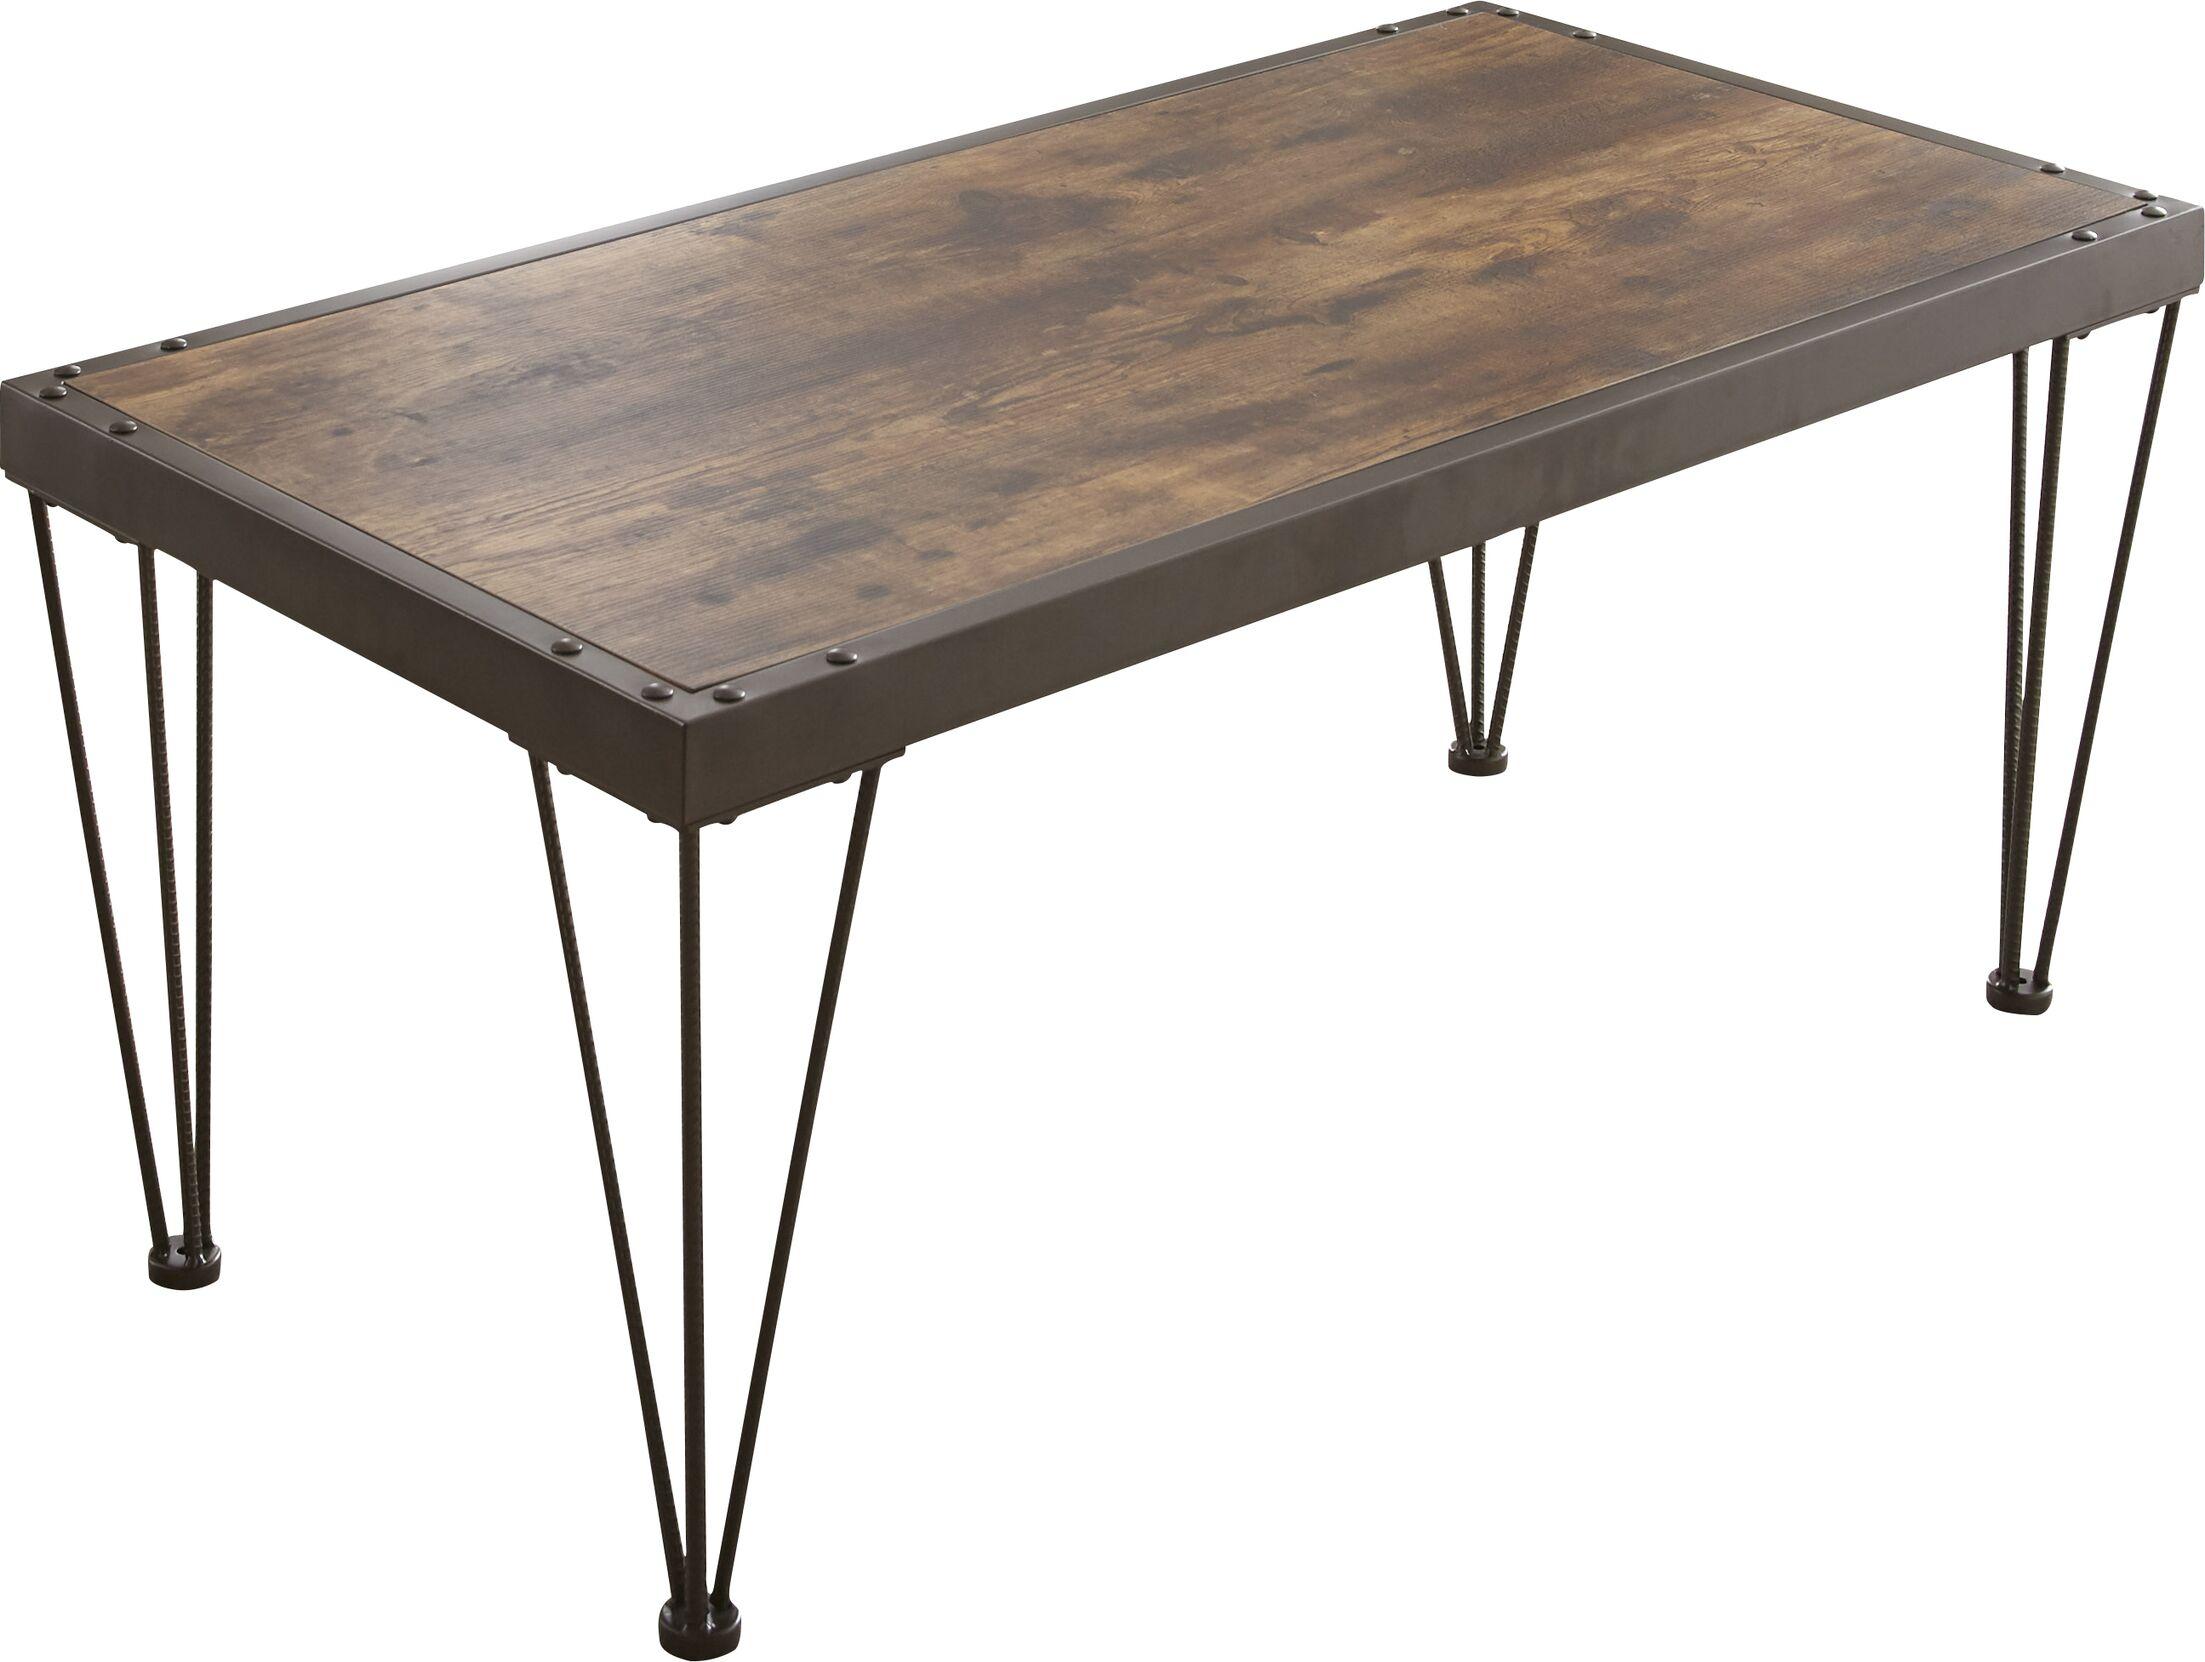 Owen 3 Piece Coffee Table Set